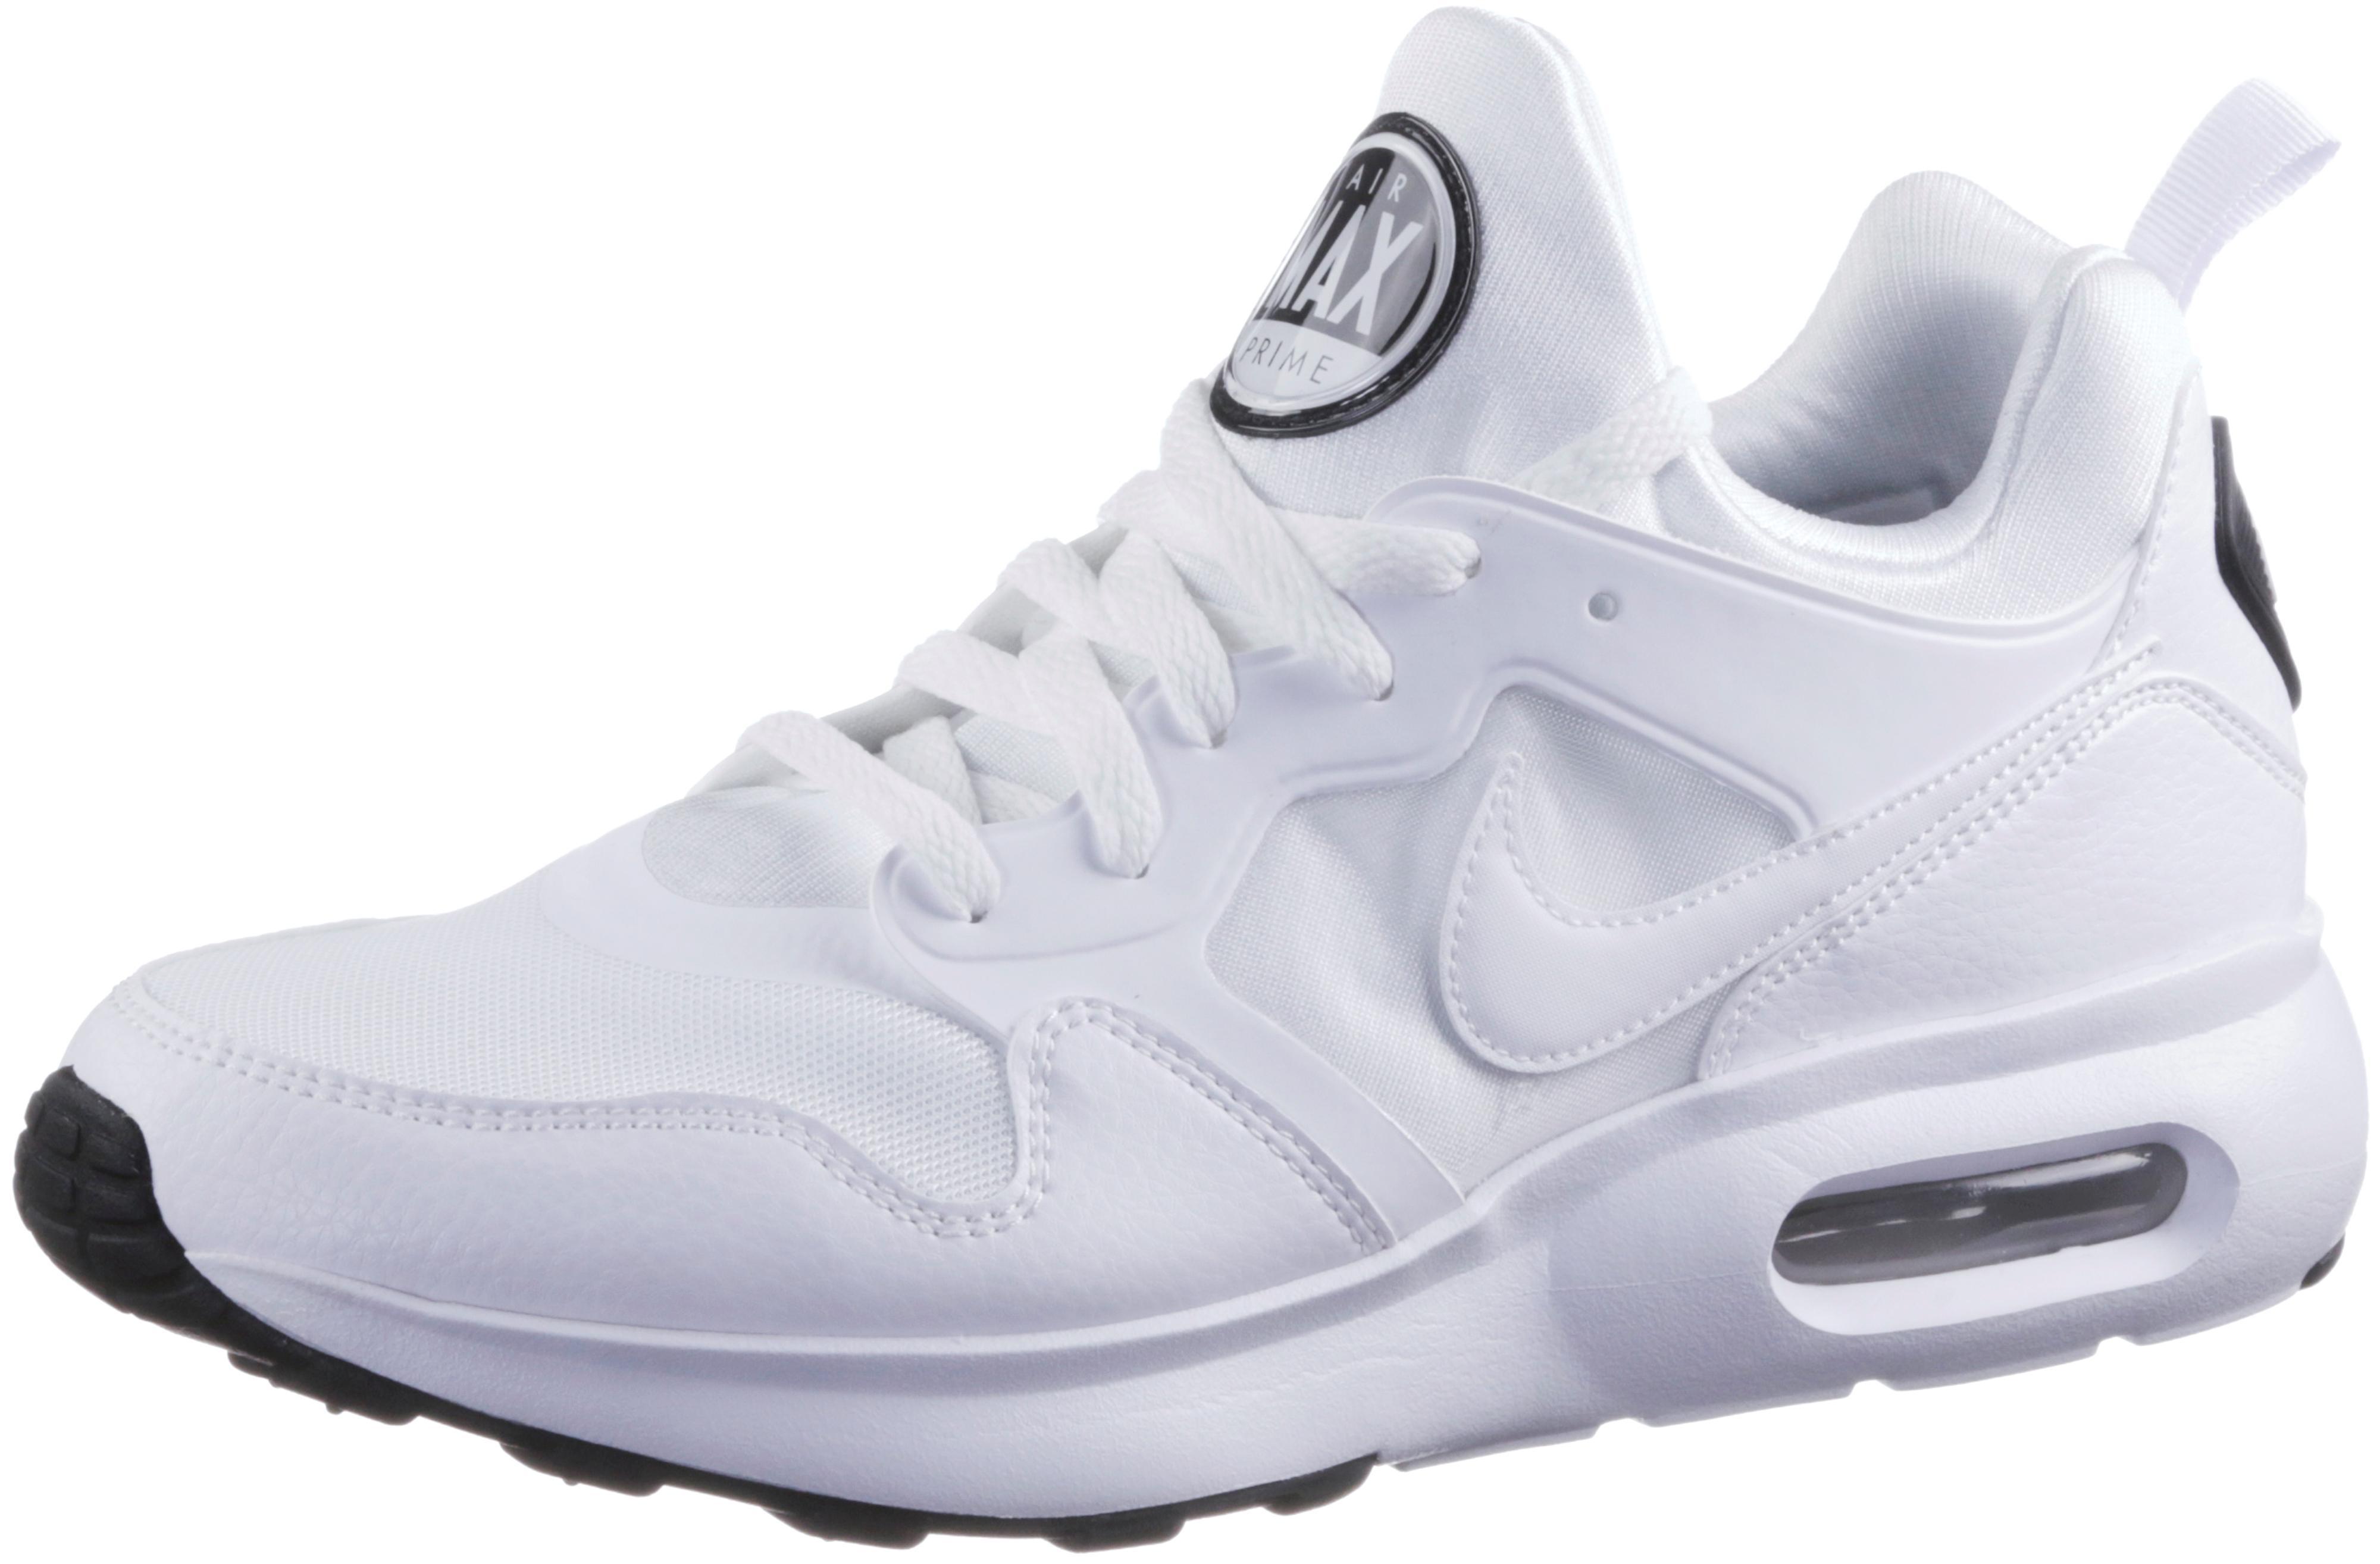 a1abd6083db183 Max Sneaker Online Nike Prime Air Von Herren Im Weiß Shop 5Rgwqvw4U